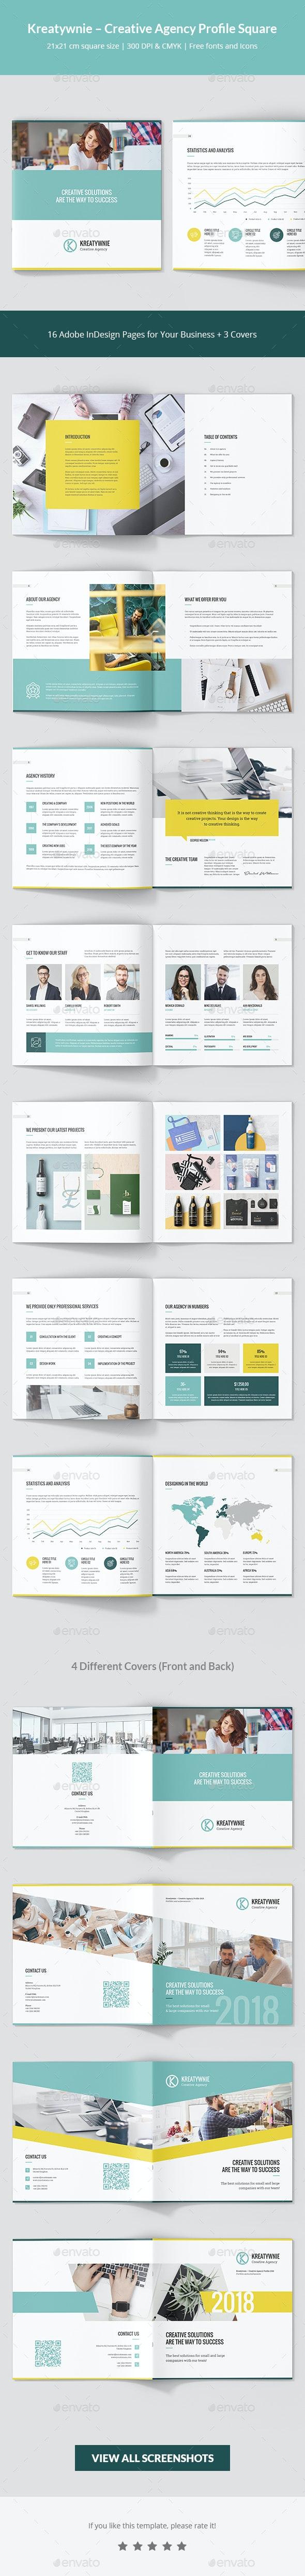 Kreatywnie – Creative Agency Profile Square - Corporate Brochures